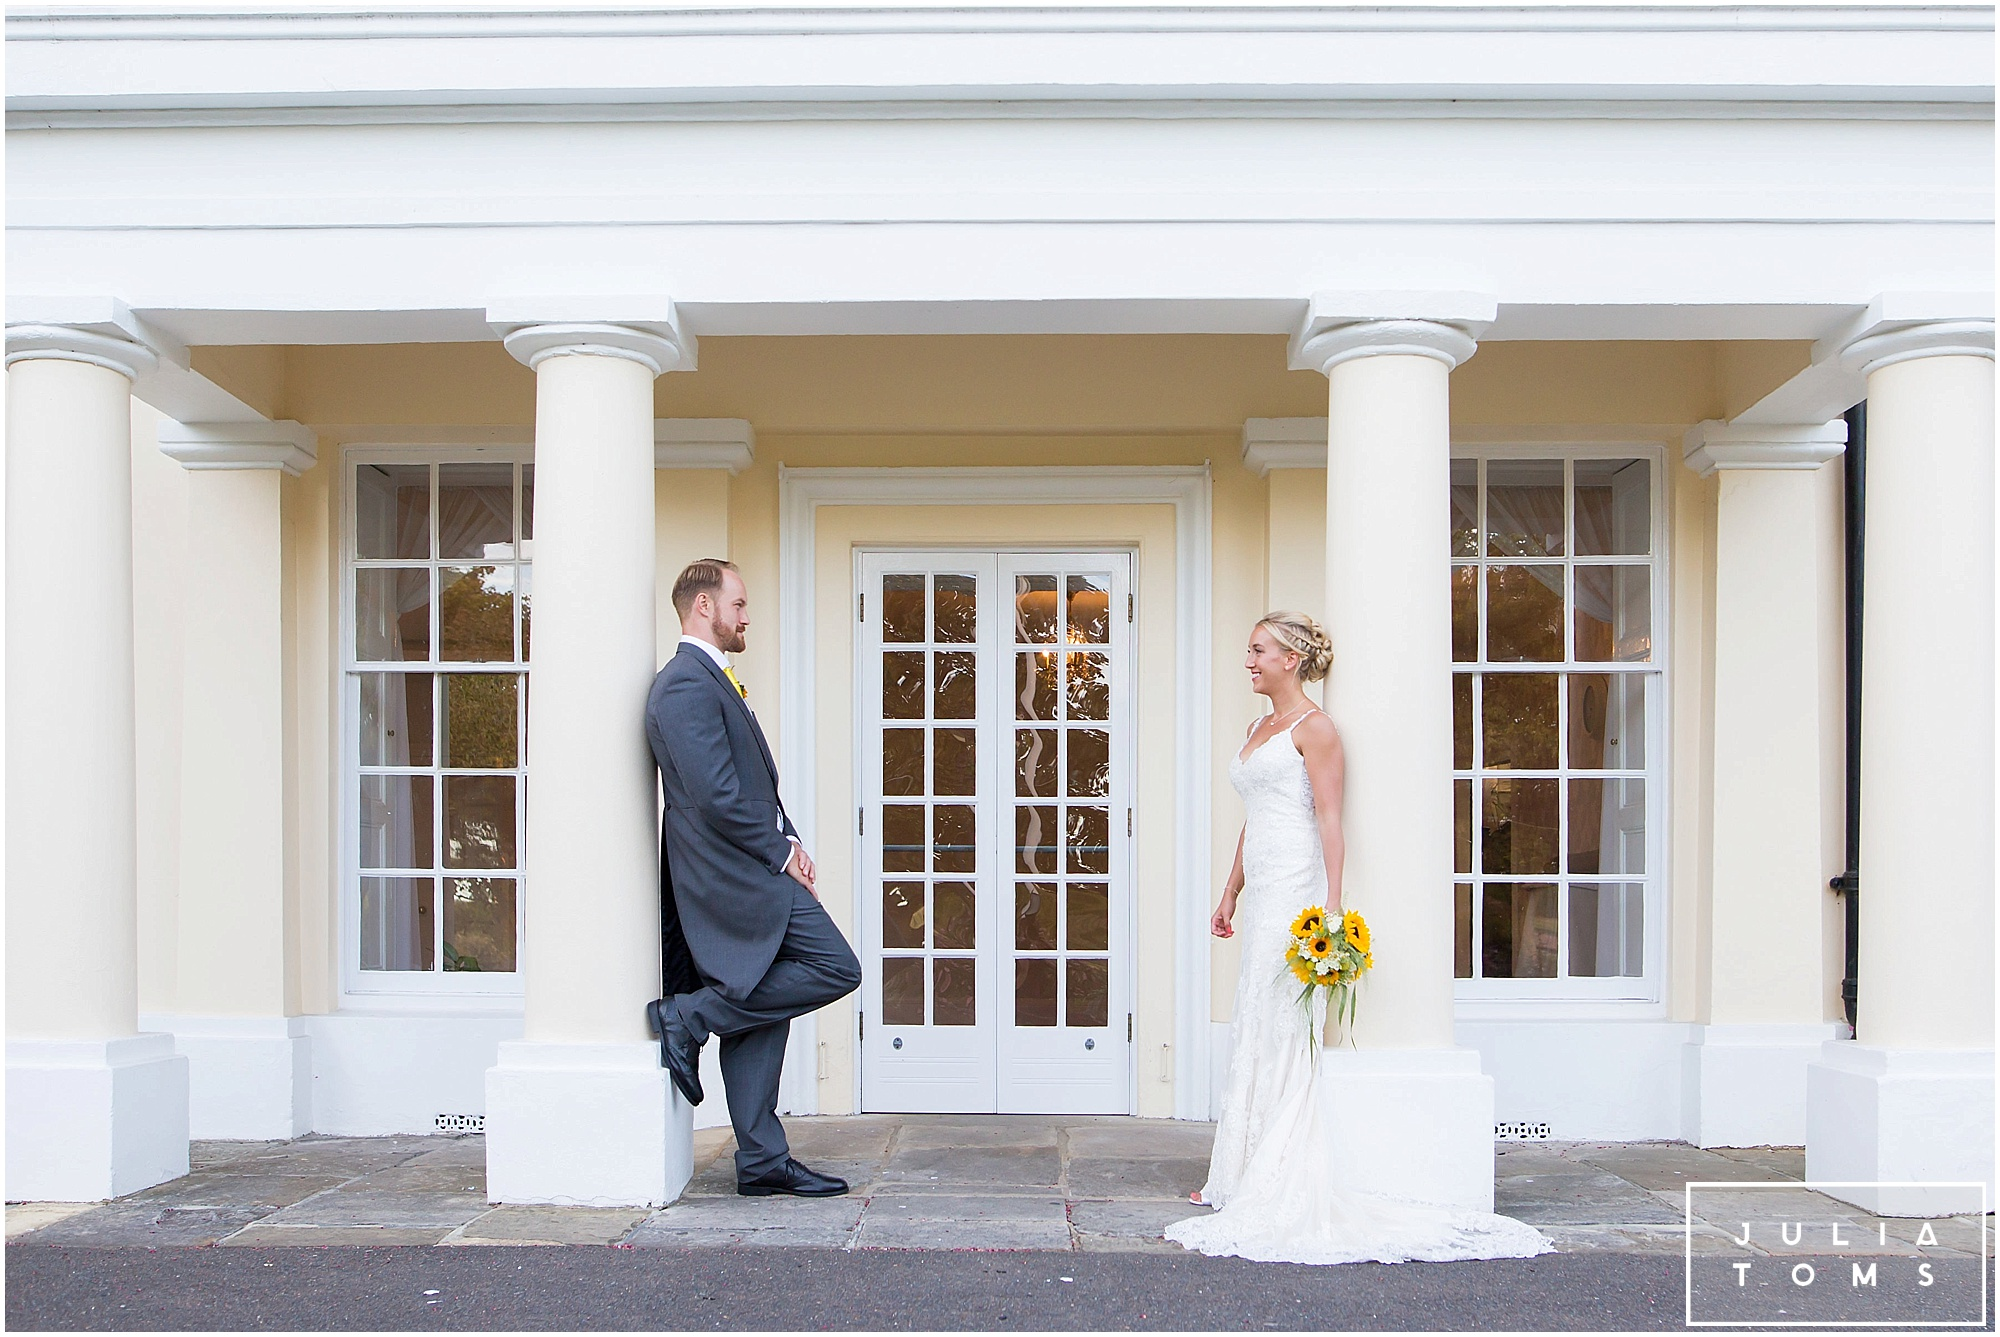 julia_toms_chichester_wedding_photographer_worthing_049.jpg